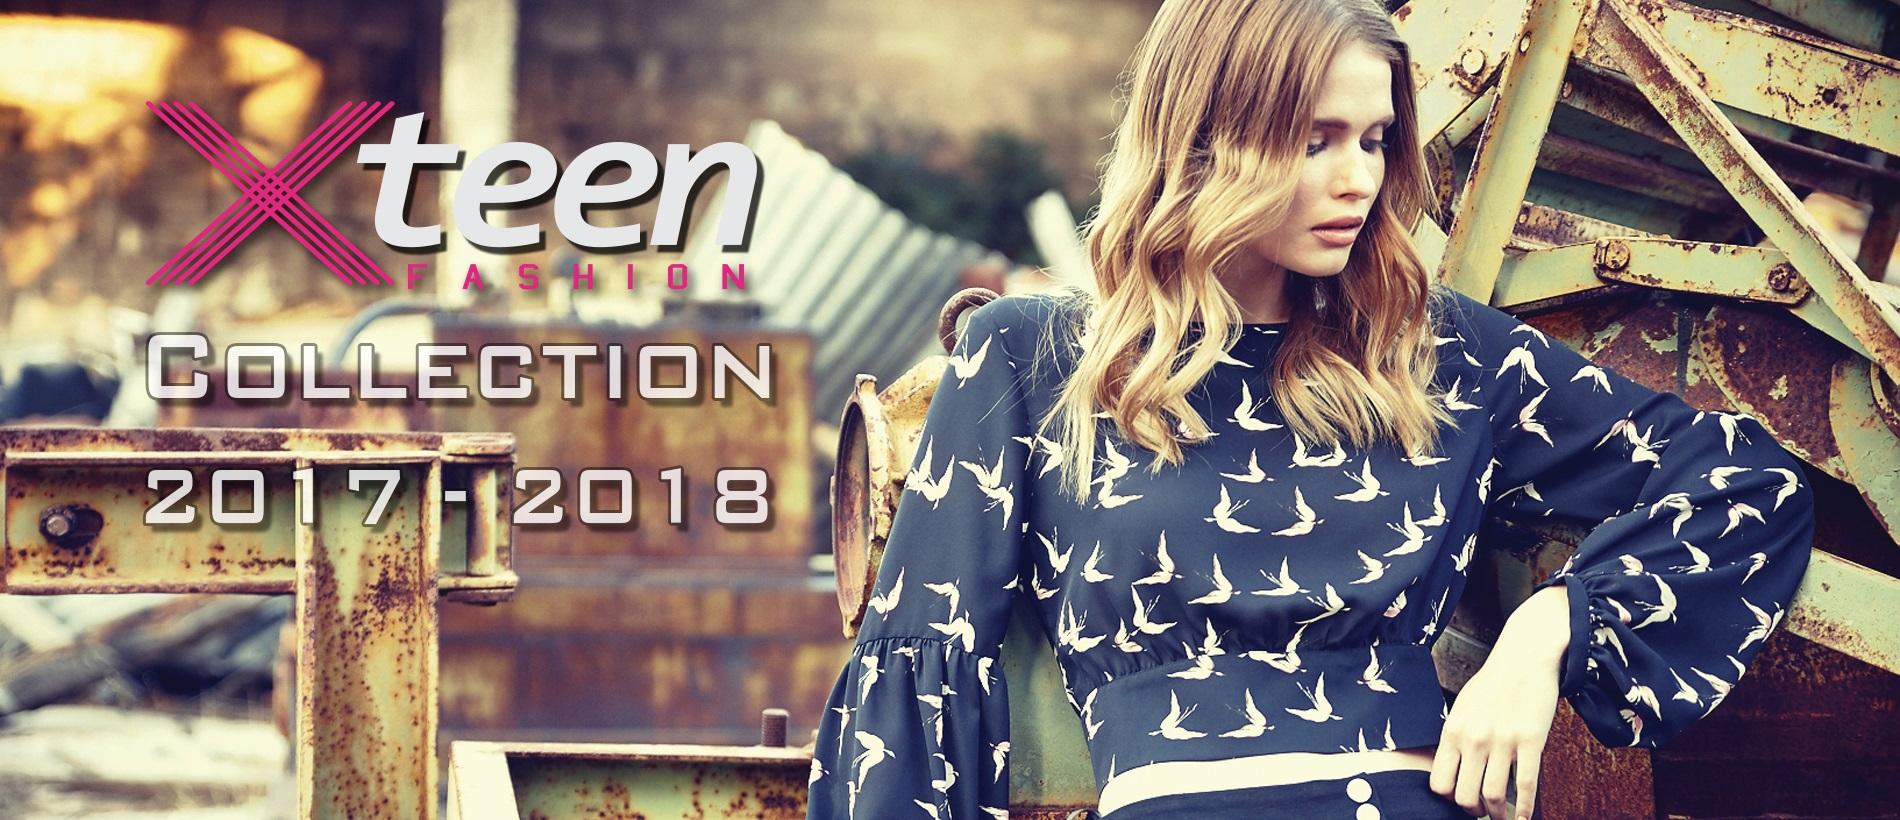 Bellino-Xteen-Slider-Image-bellino-FW-2017-21.new-collectionKxteen